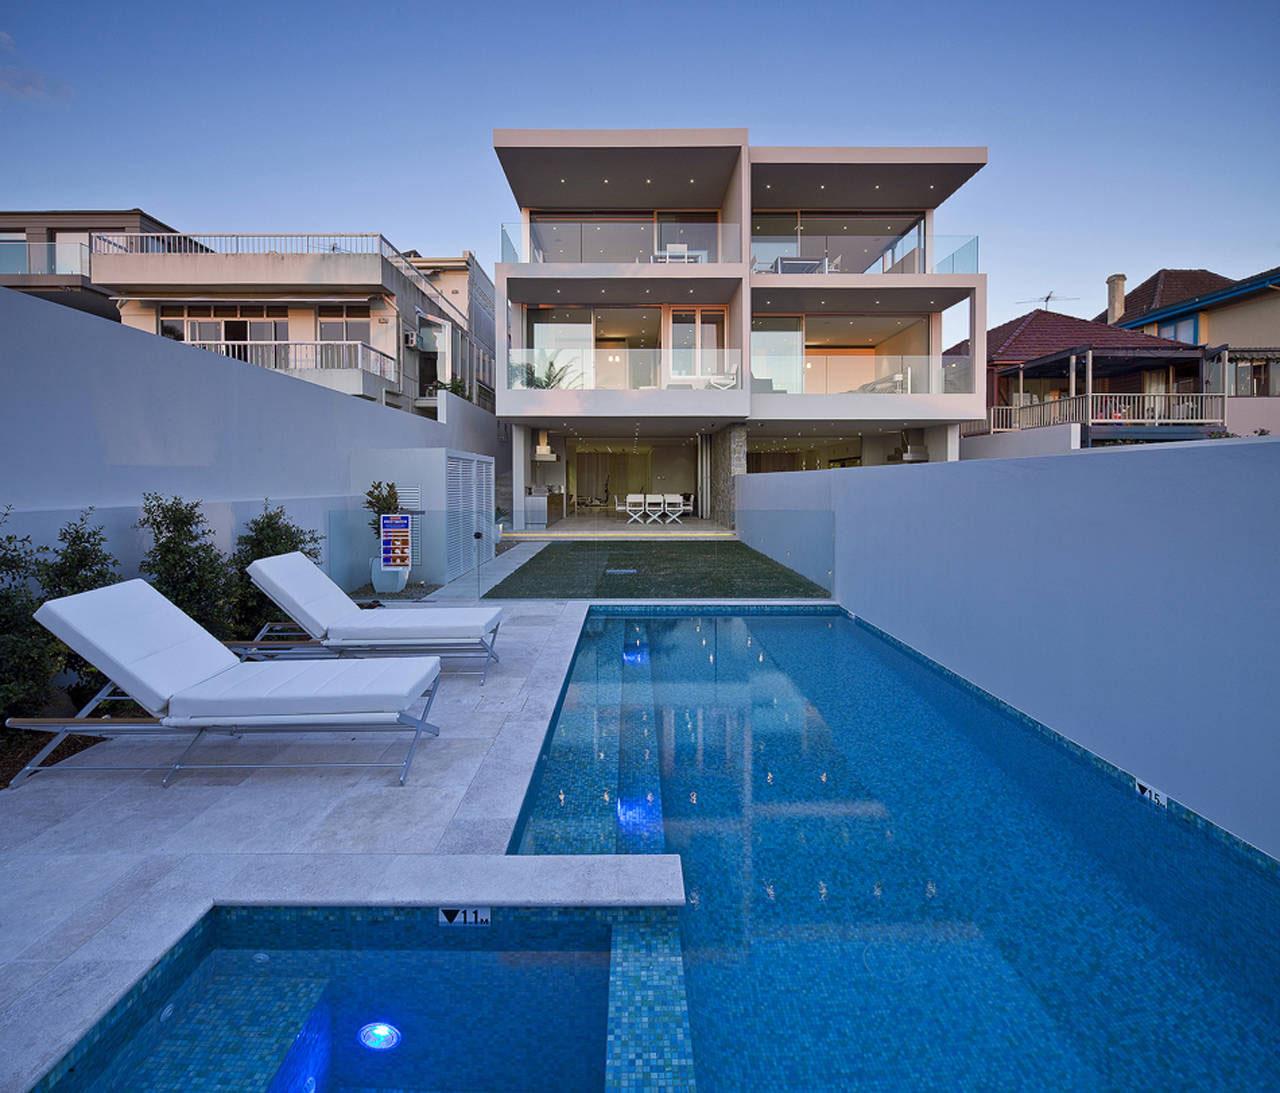 Contemporary Transparent Duplex House Design With Pool